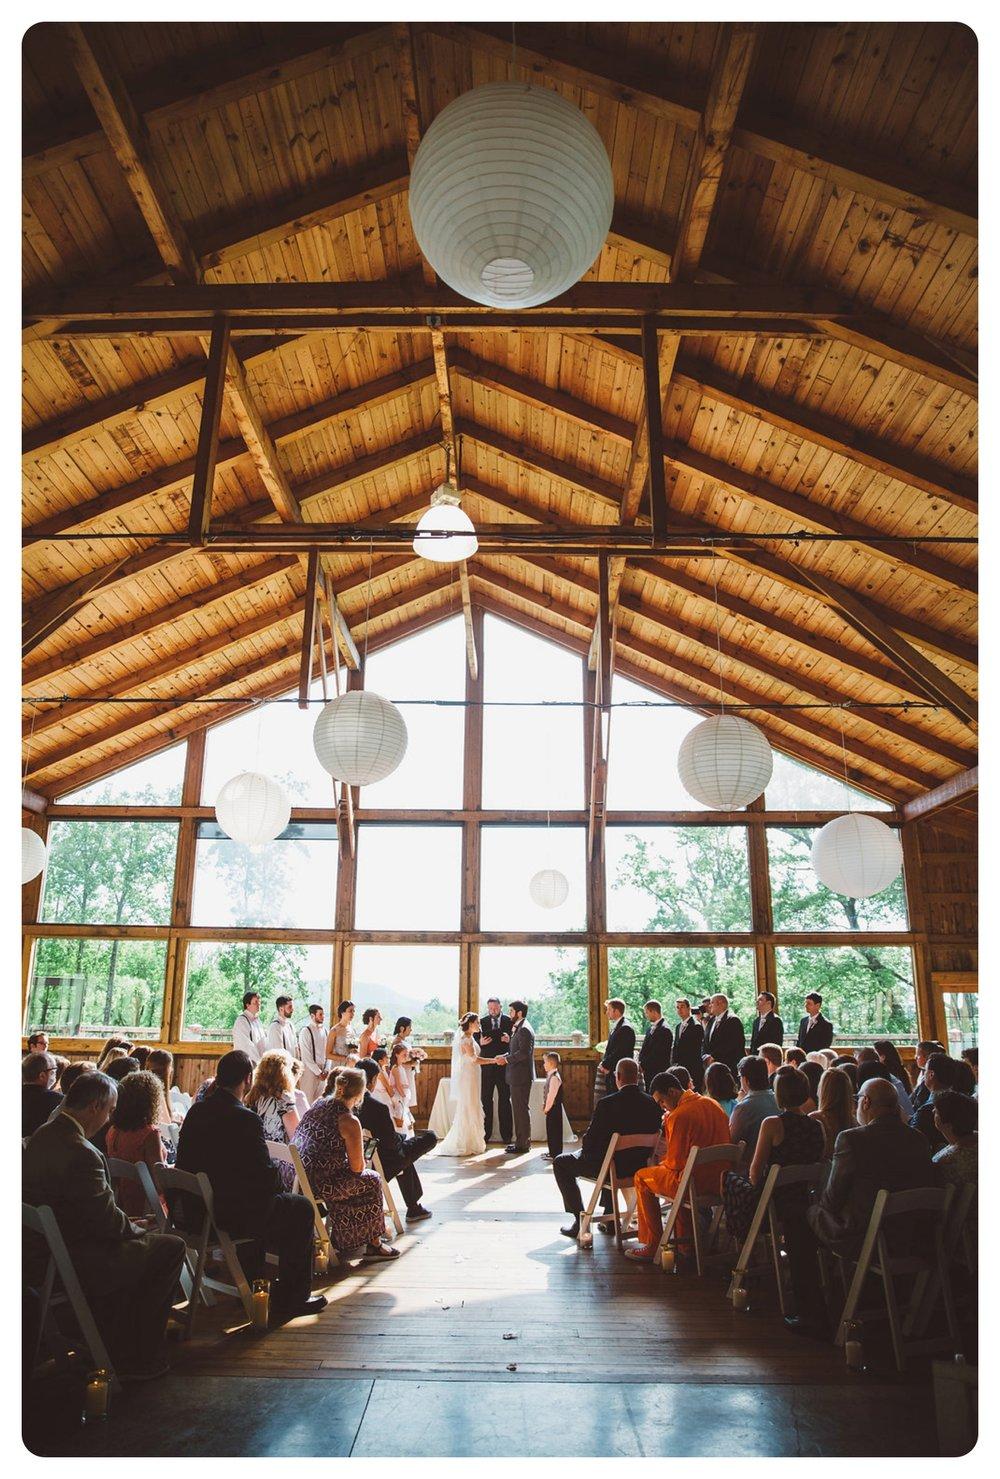 Braeloch-Weddings-Wedding-Photographer-Pat-Cori-Photography-021.jpg